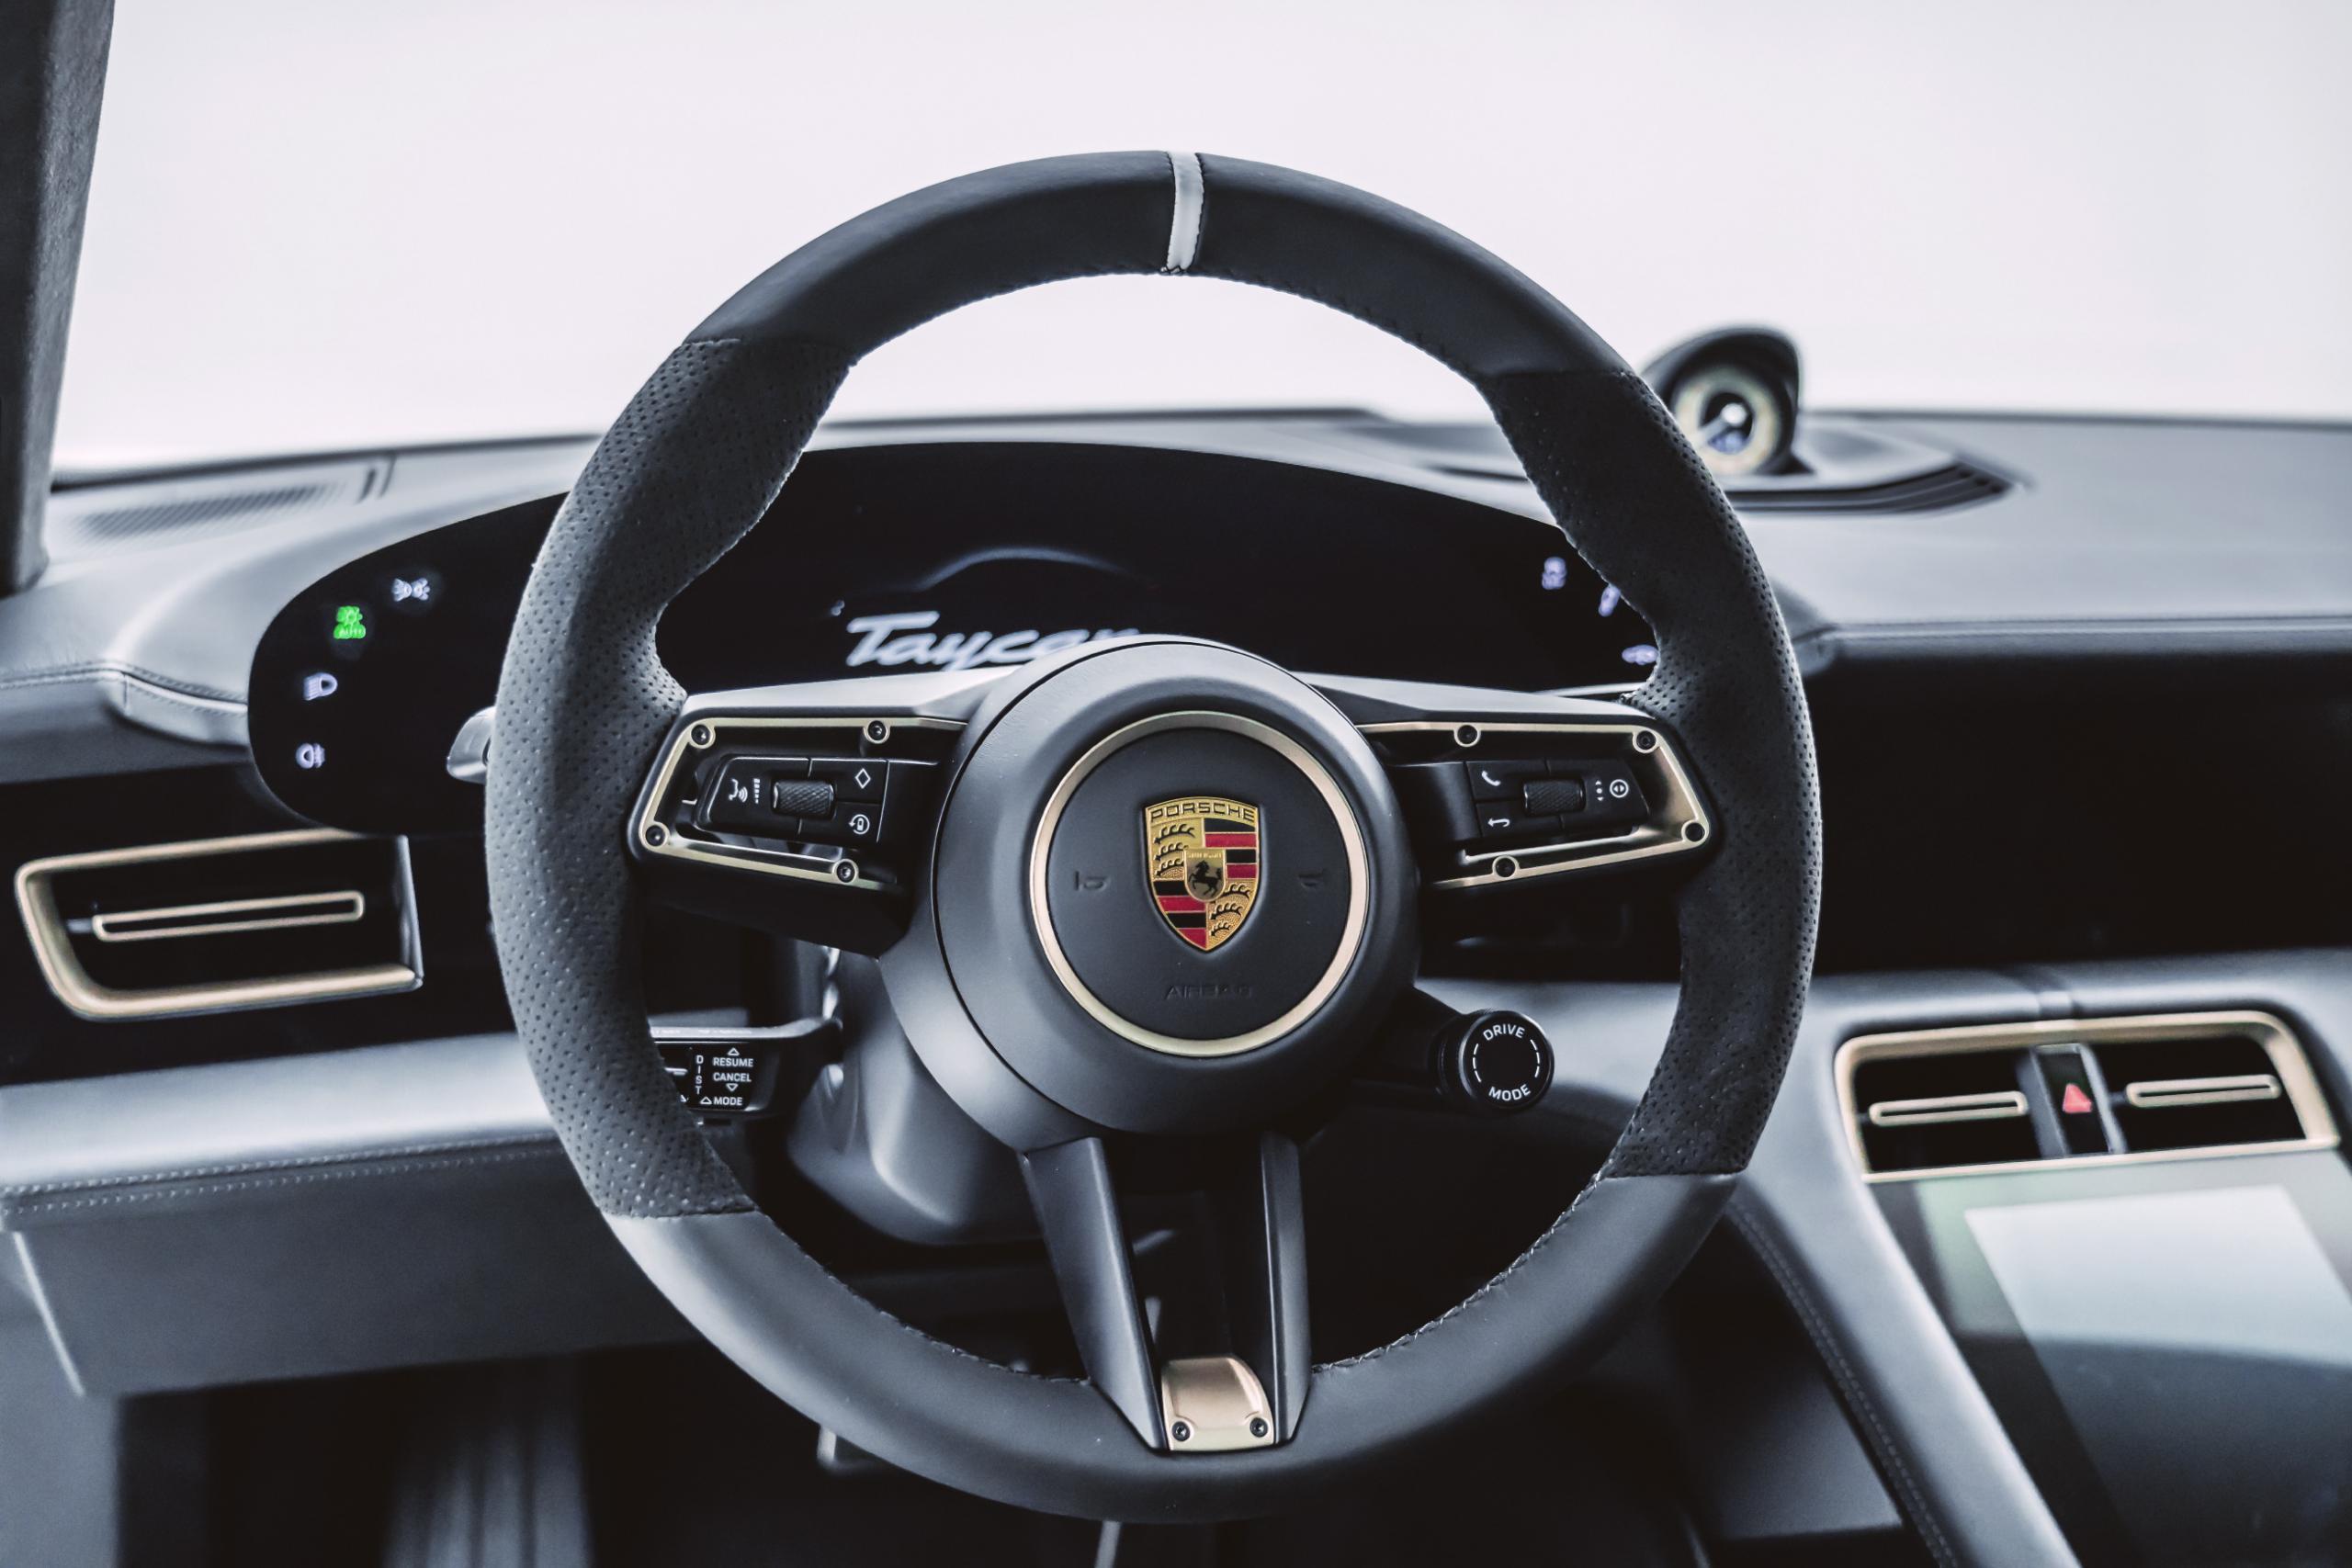 mansory porsche taycan carbon fiber body kit steering wheel interior 2020 2021